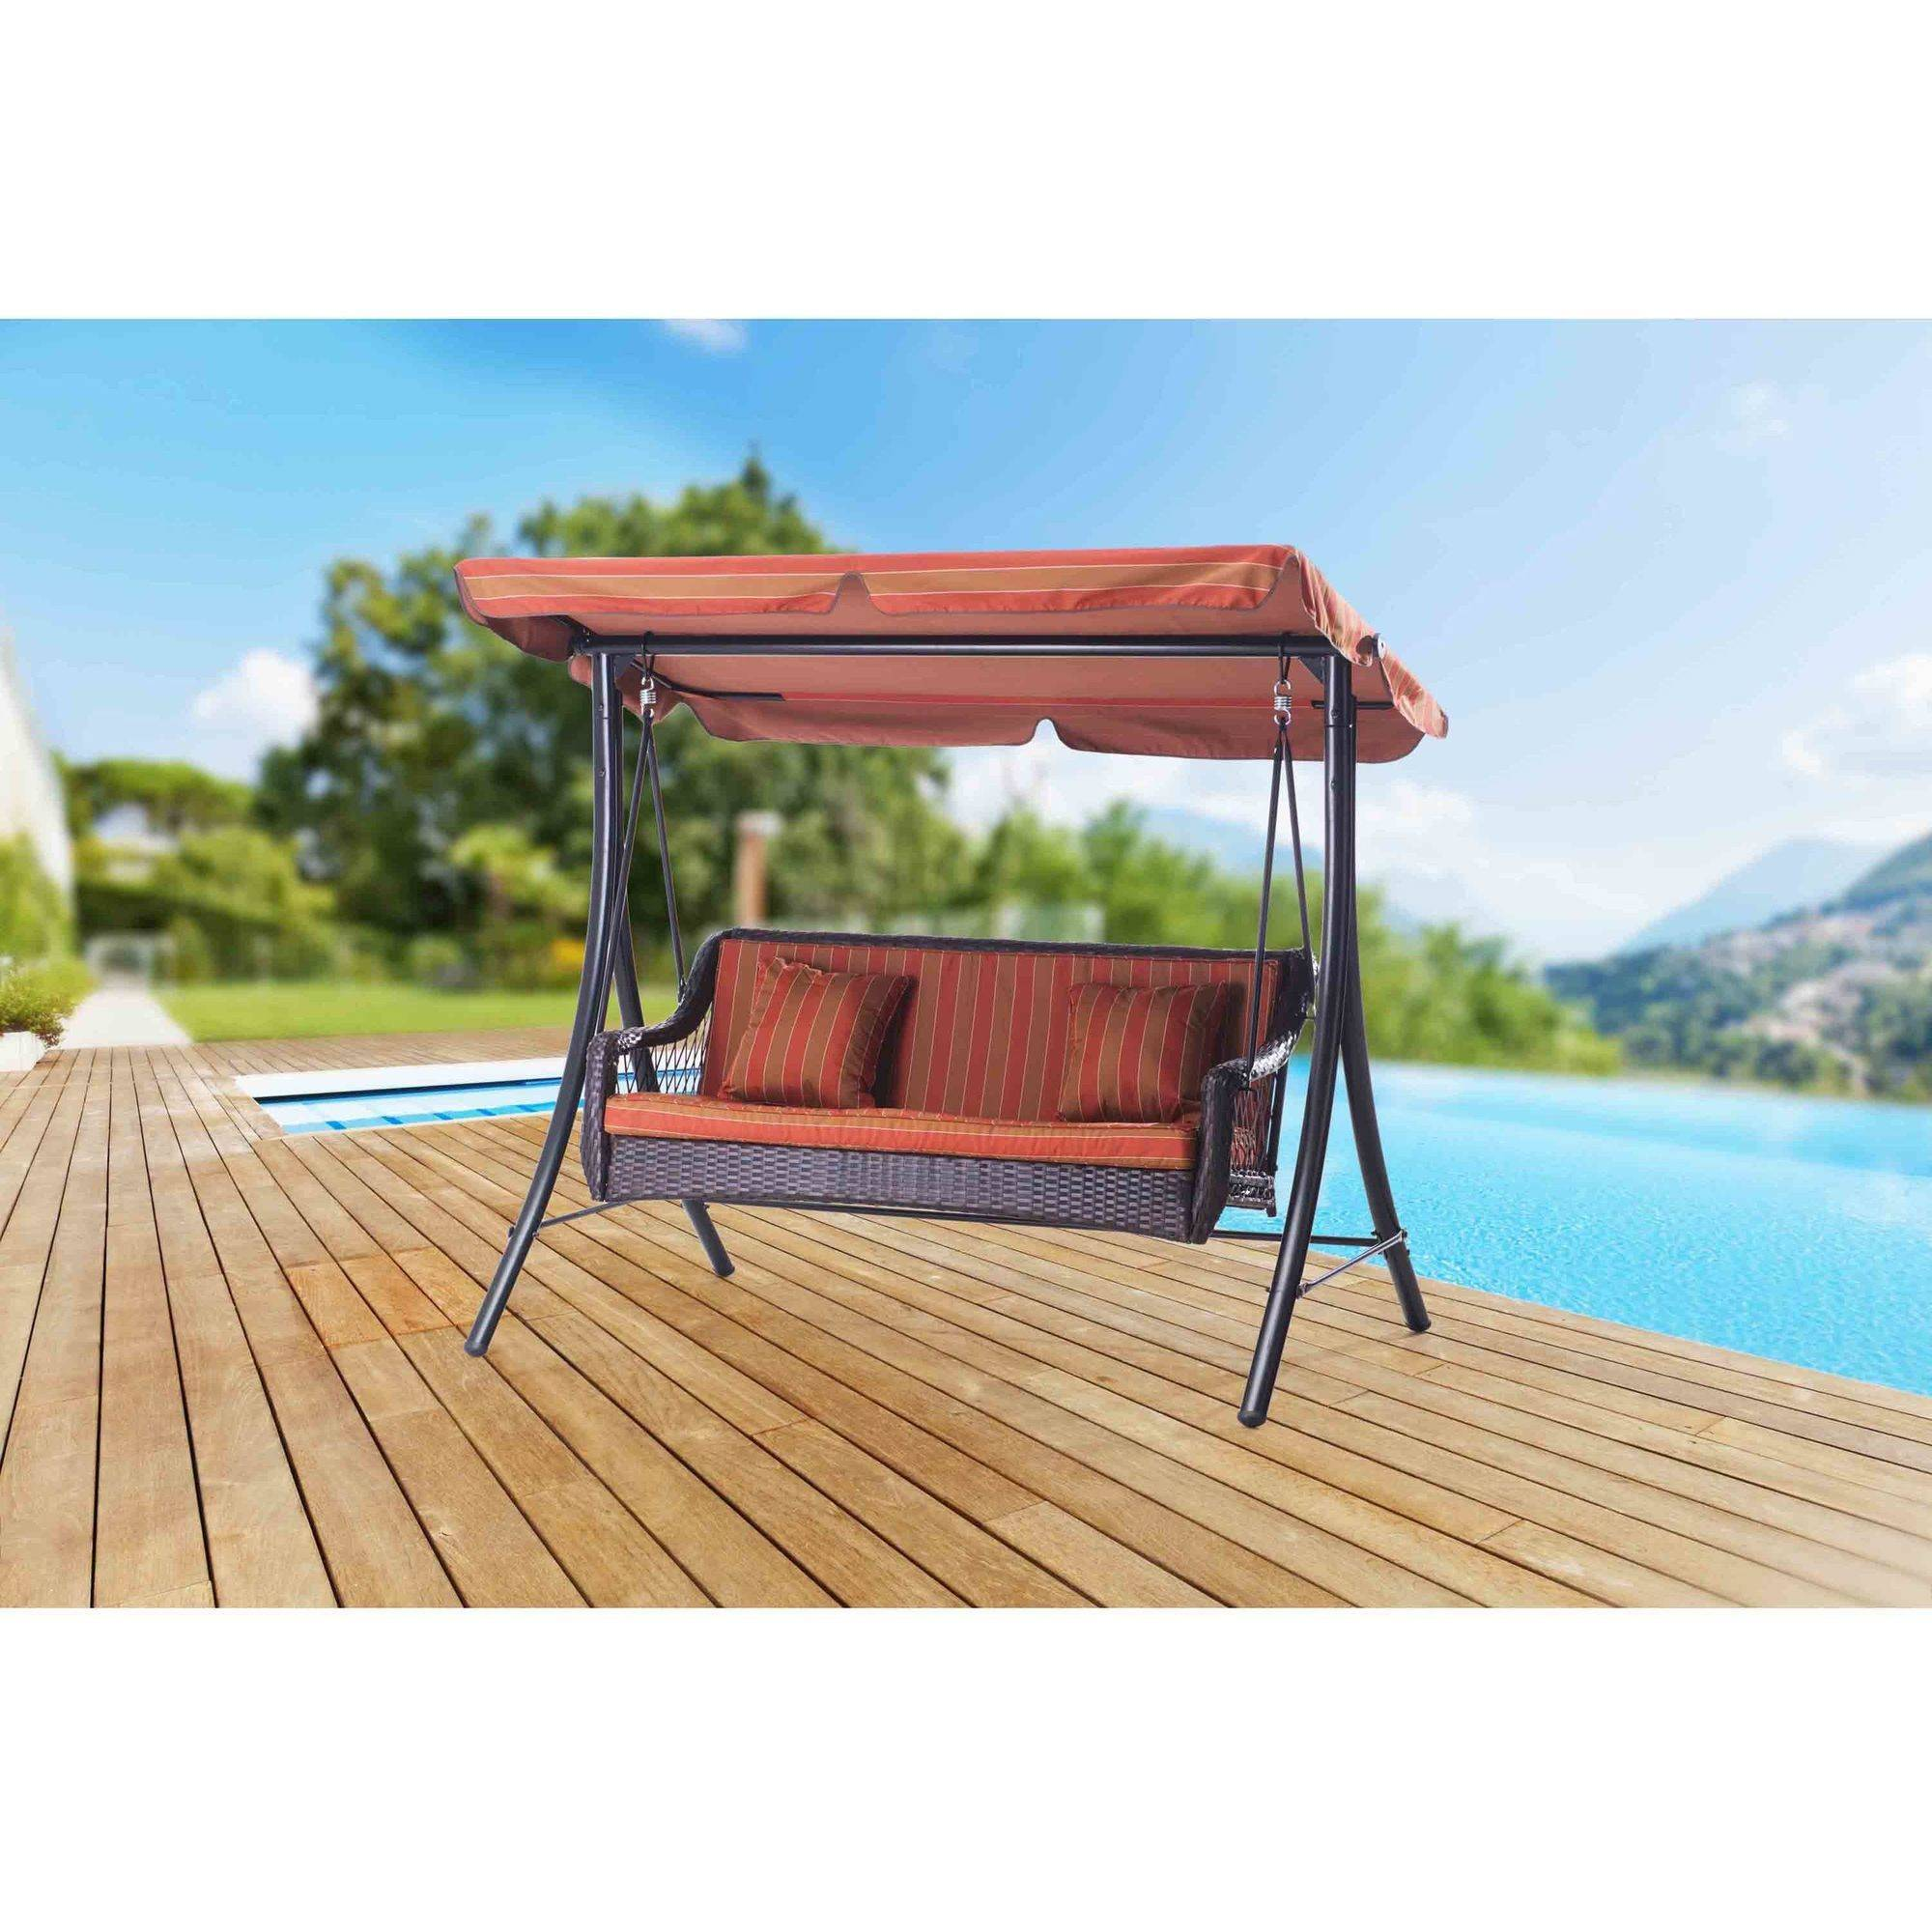 "Sunjoy 110205004 Curry Steel Porch Swing, 81"" x 65"" x 68"" by Porch Swings"